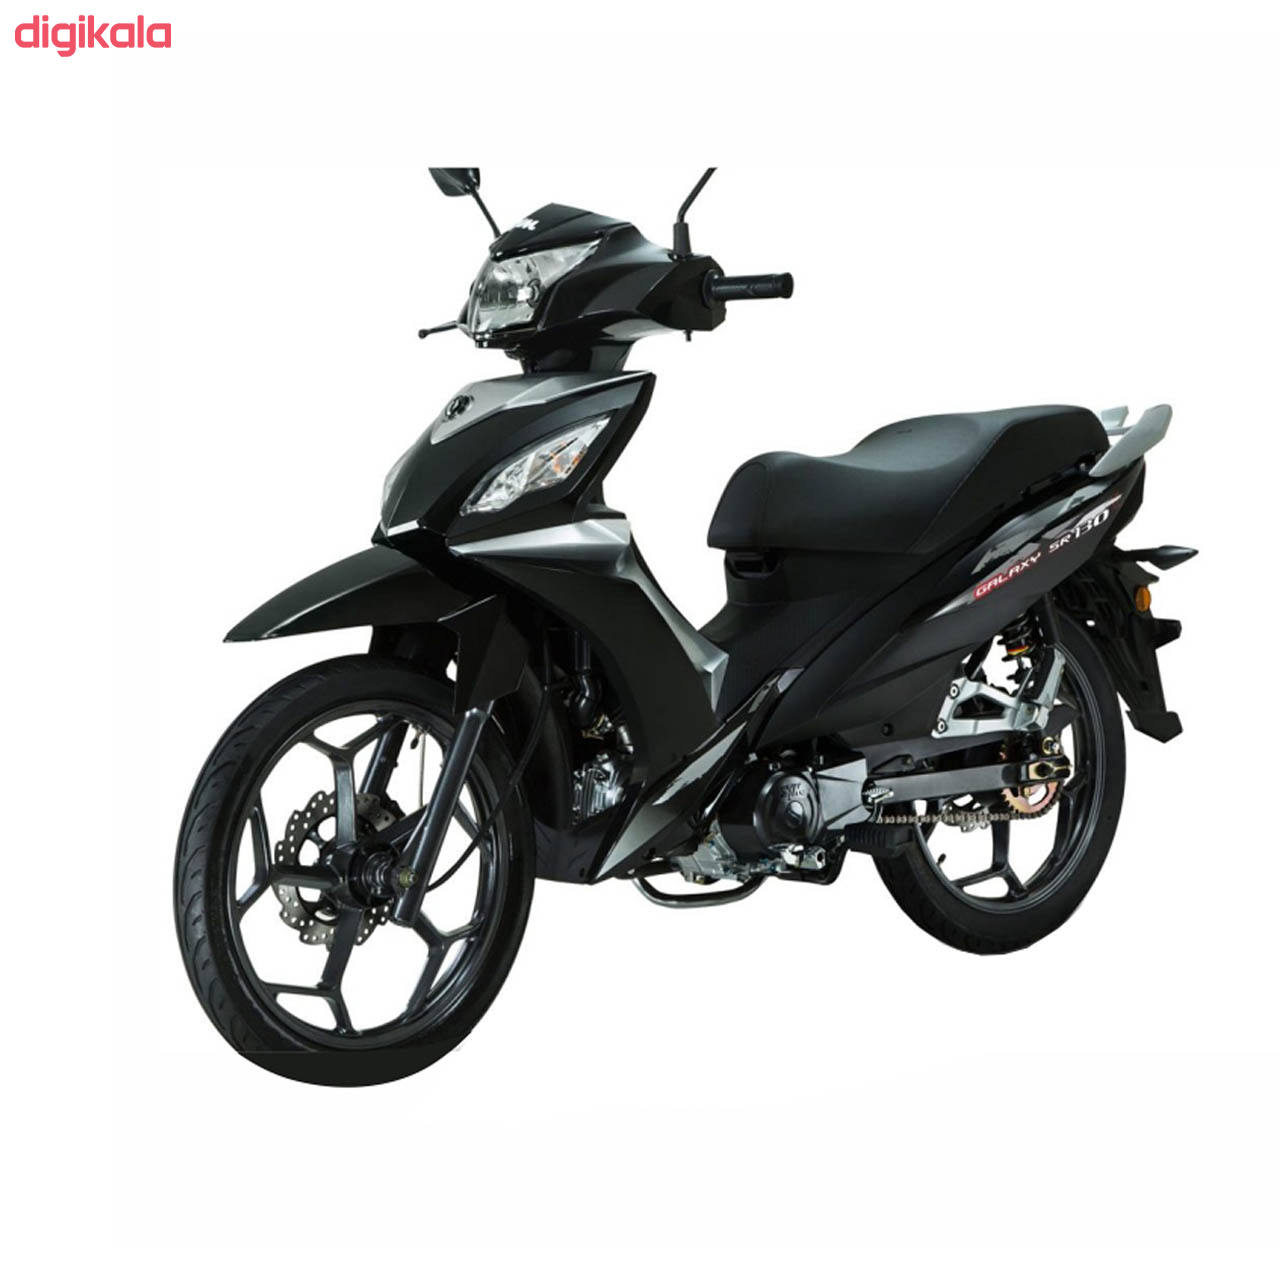 موتورسیکلت گلکسی مدل SR130 حجم 130 سی سیسال 1399 main 1 5